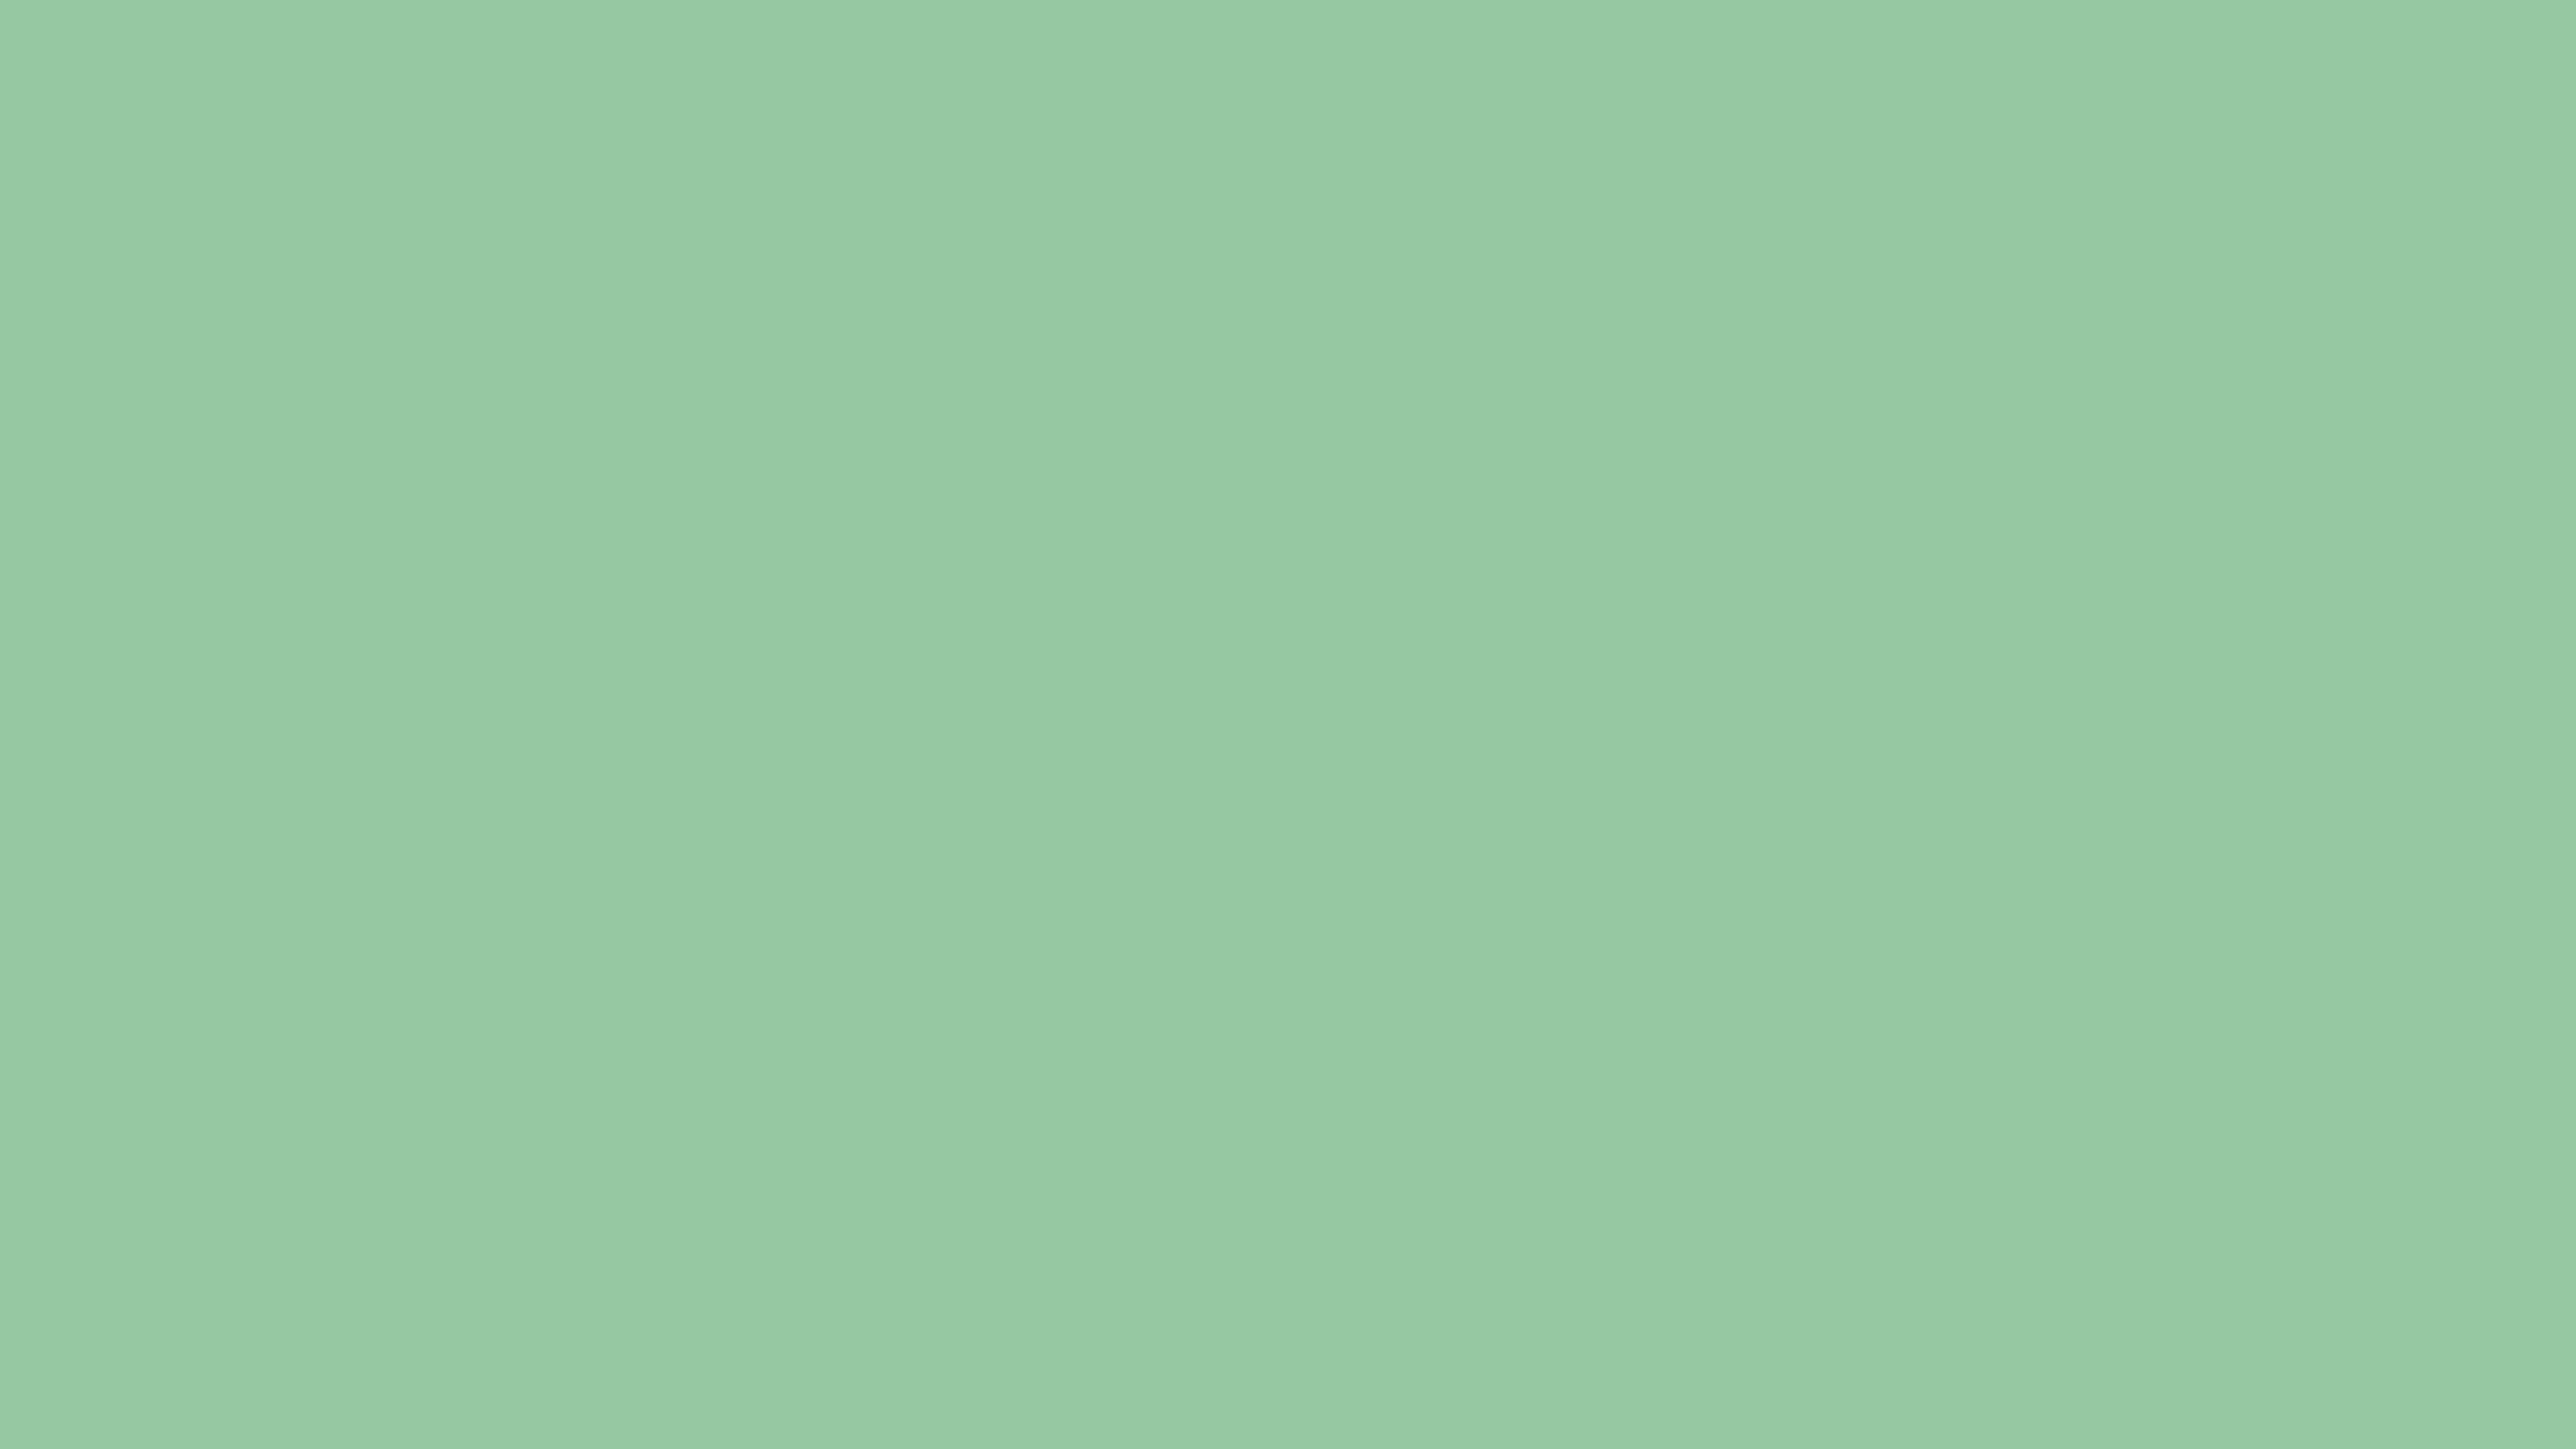 3840x2160 Eton Blue Solid Color Background